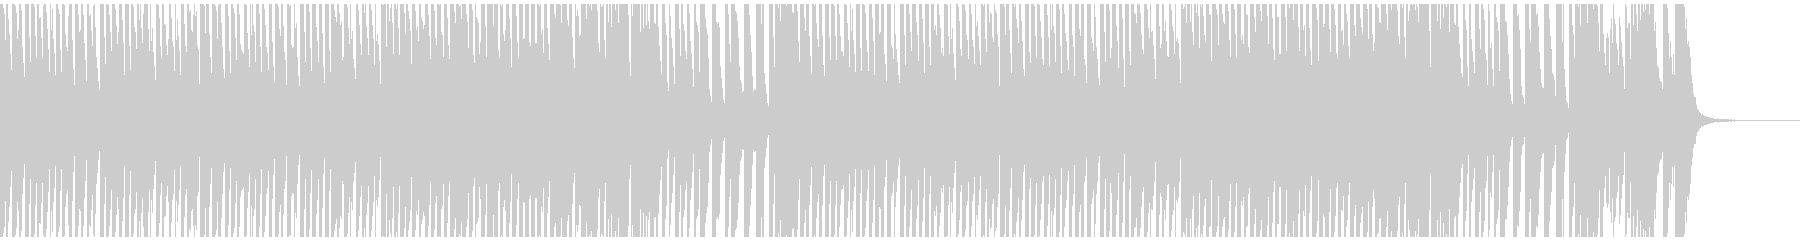 CMやシンキングタイムに コミカルBGMの未再生の波形